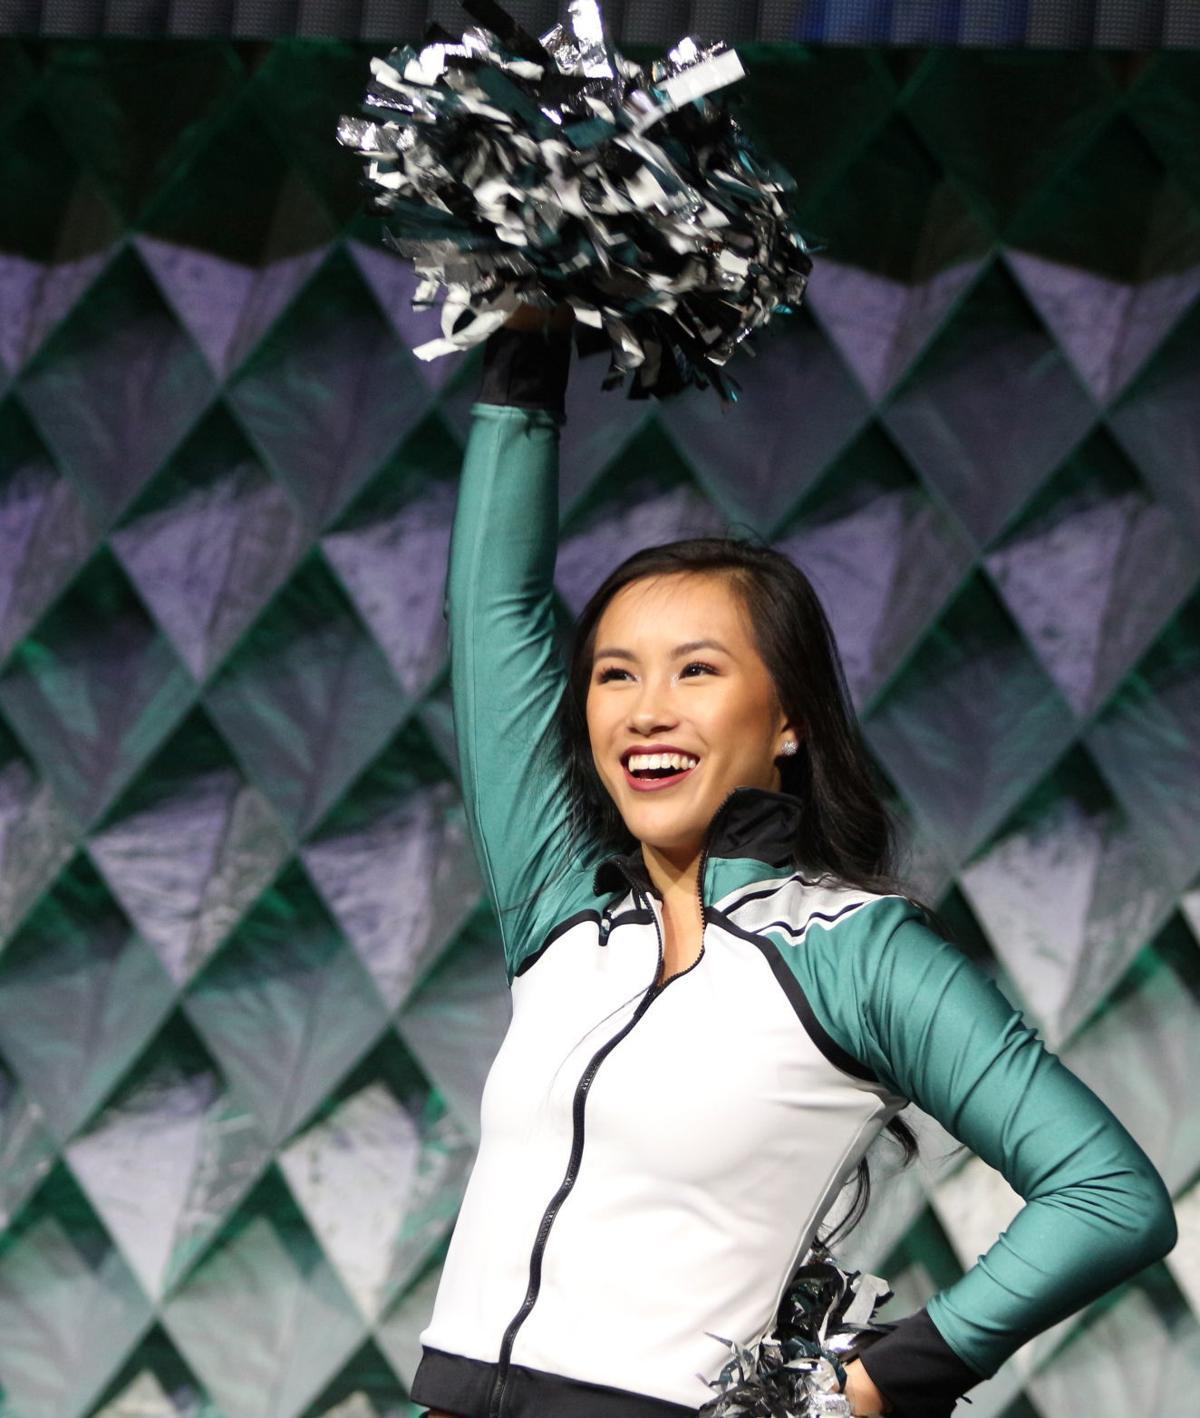 UD Dance Marathon Raises $2 Million For Childhood Cancer